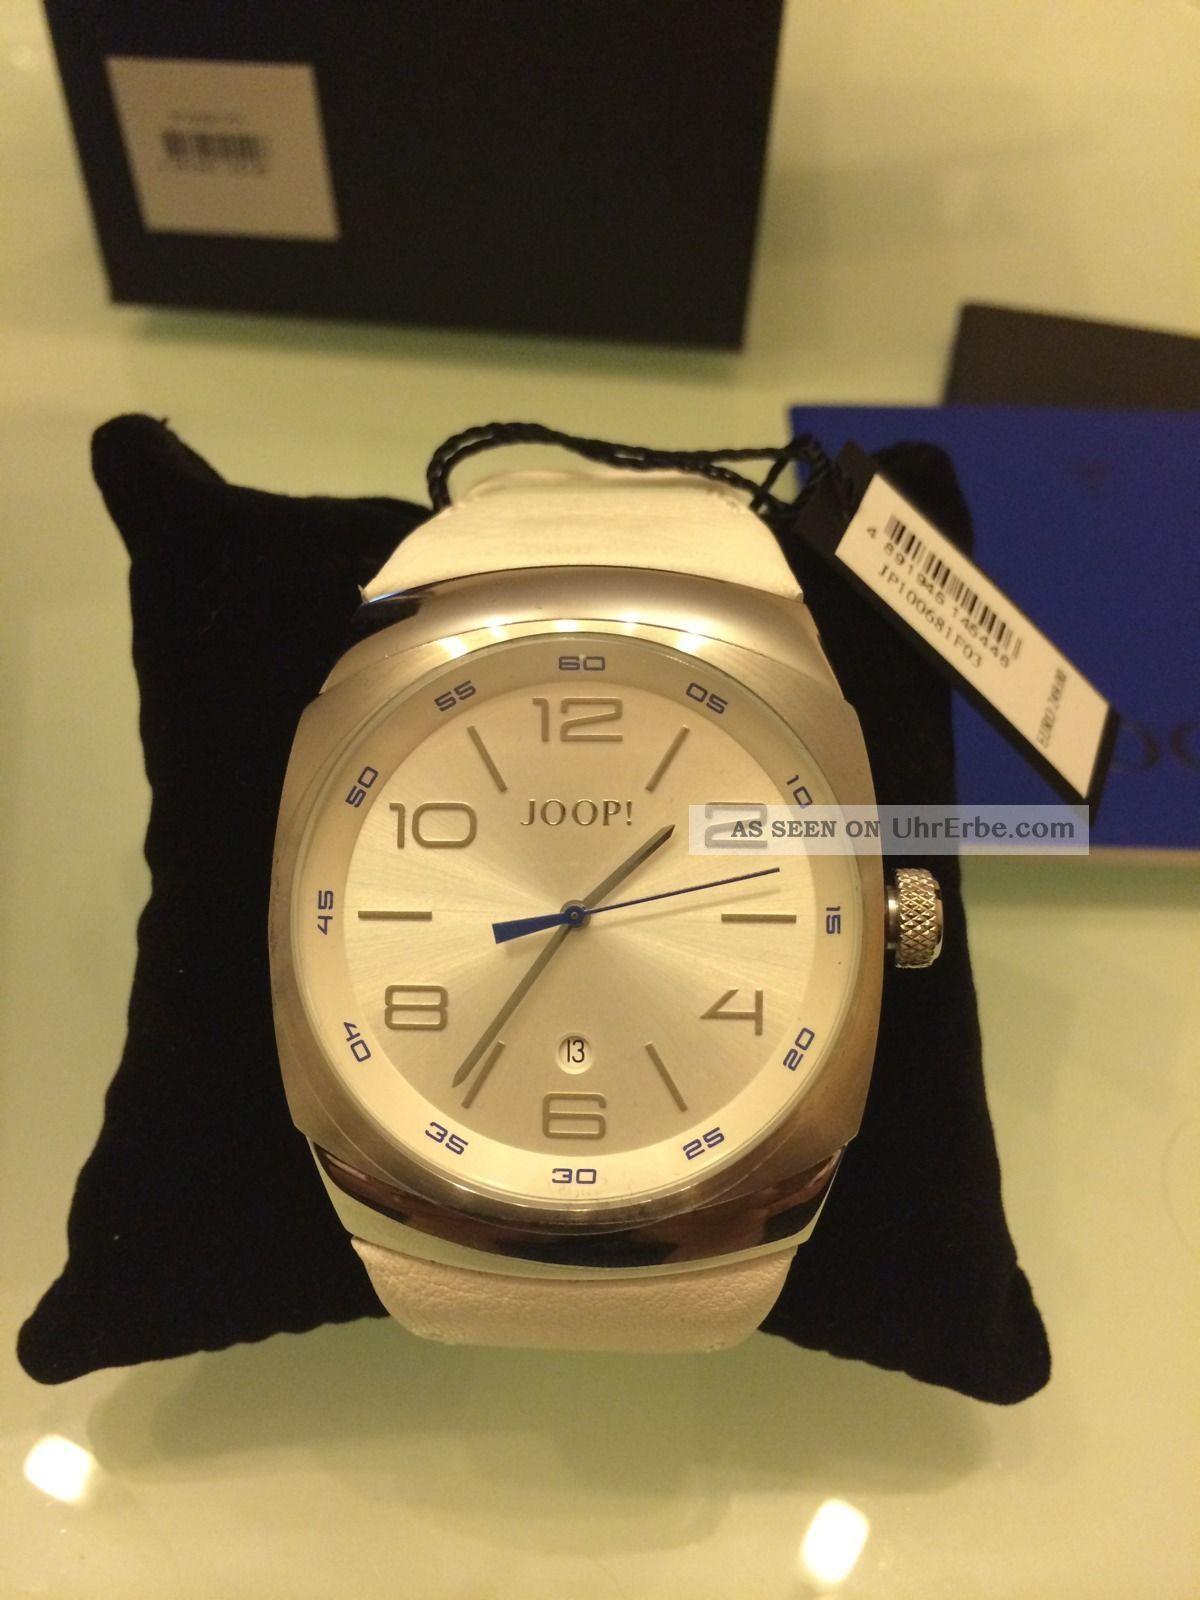 Joop Odyssey Herrenuhr Jp100681f03 Geschenkbox Weißes Lederarmband,  Np;249€ Armbanduhren Bild